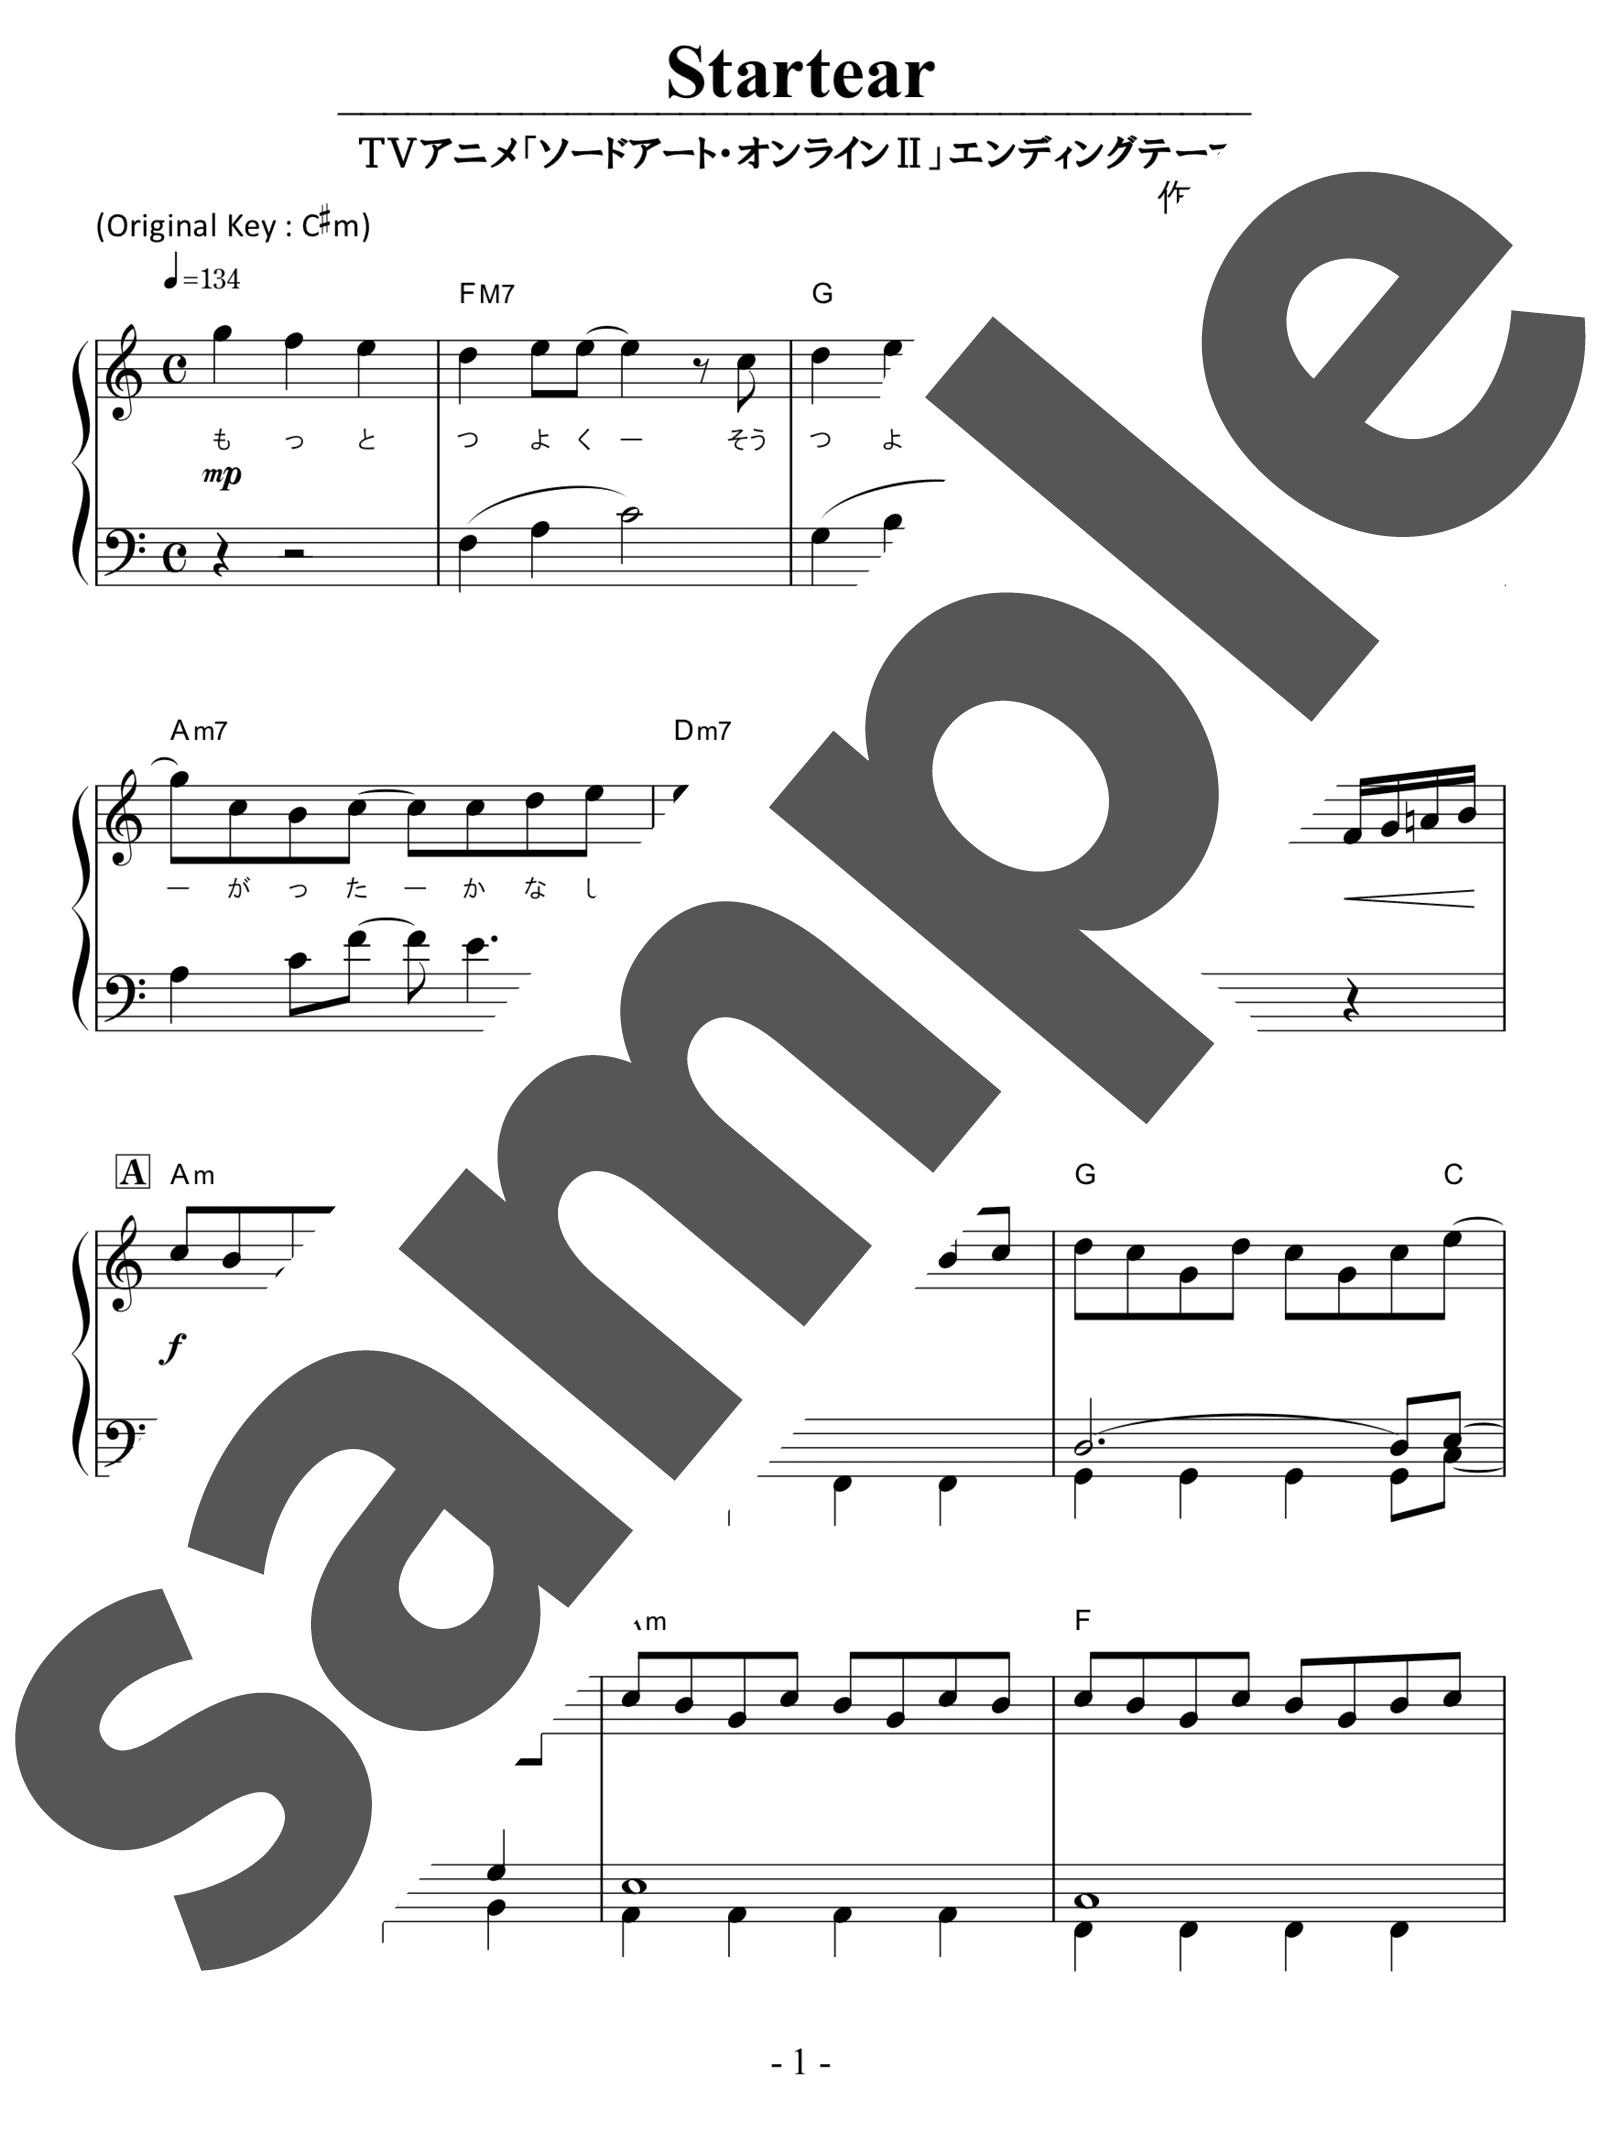 「Startear」のサンプル楽譜